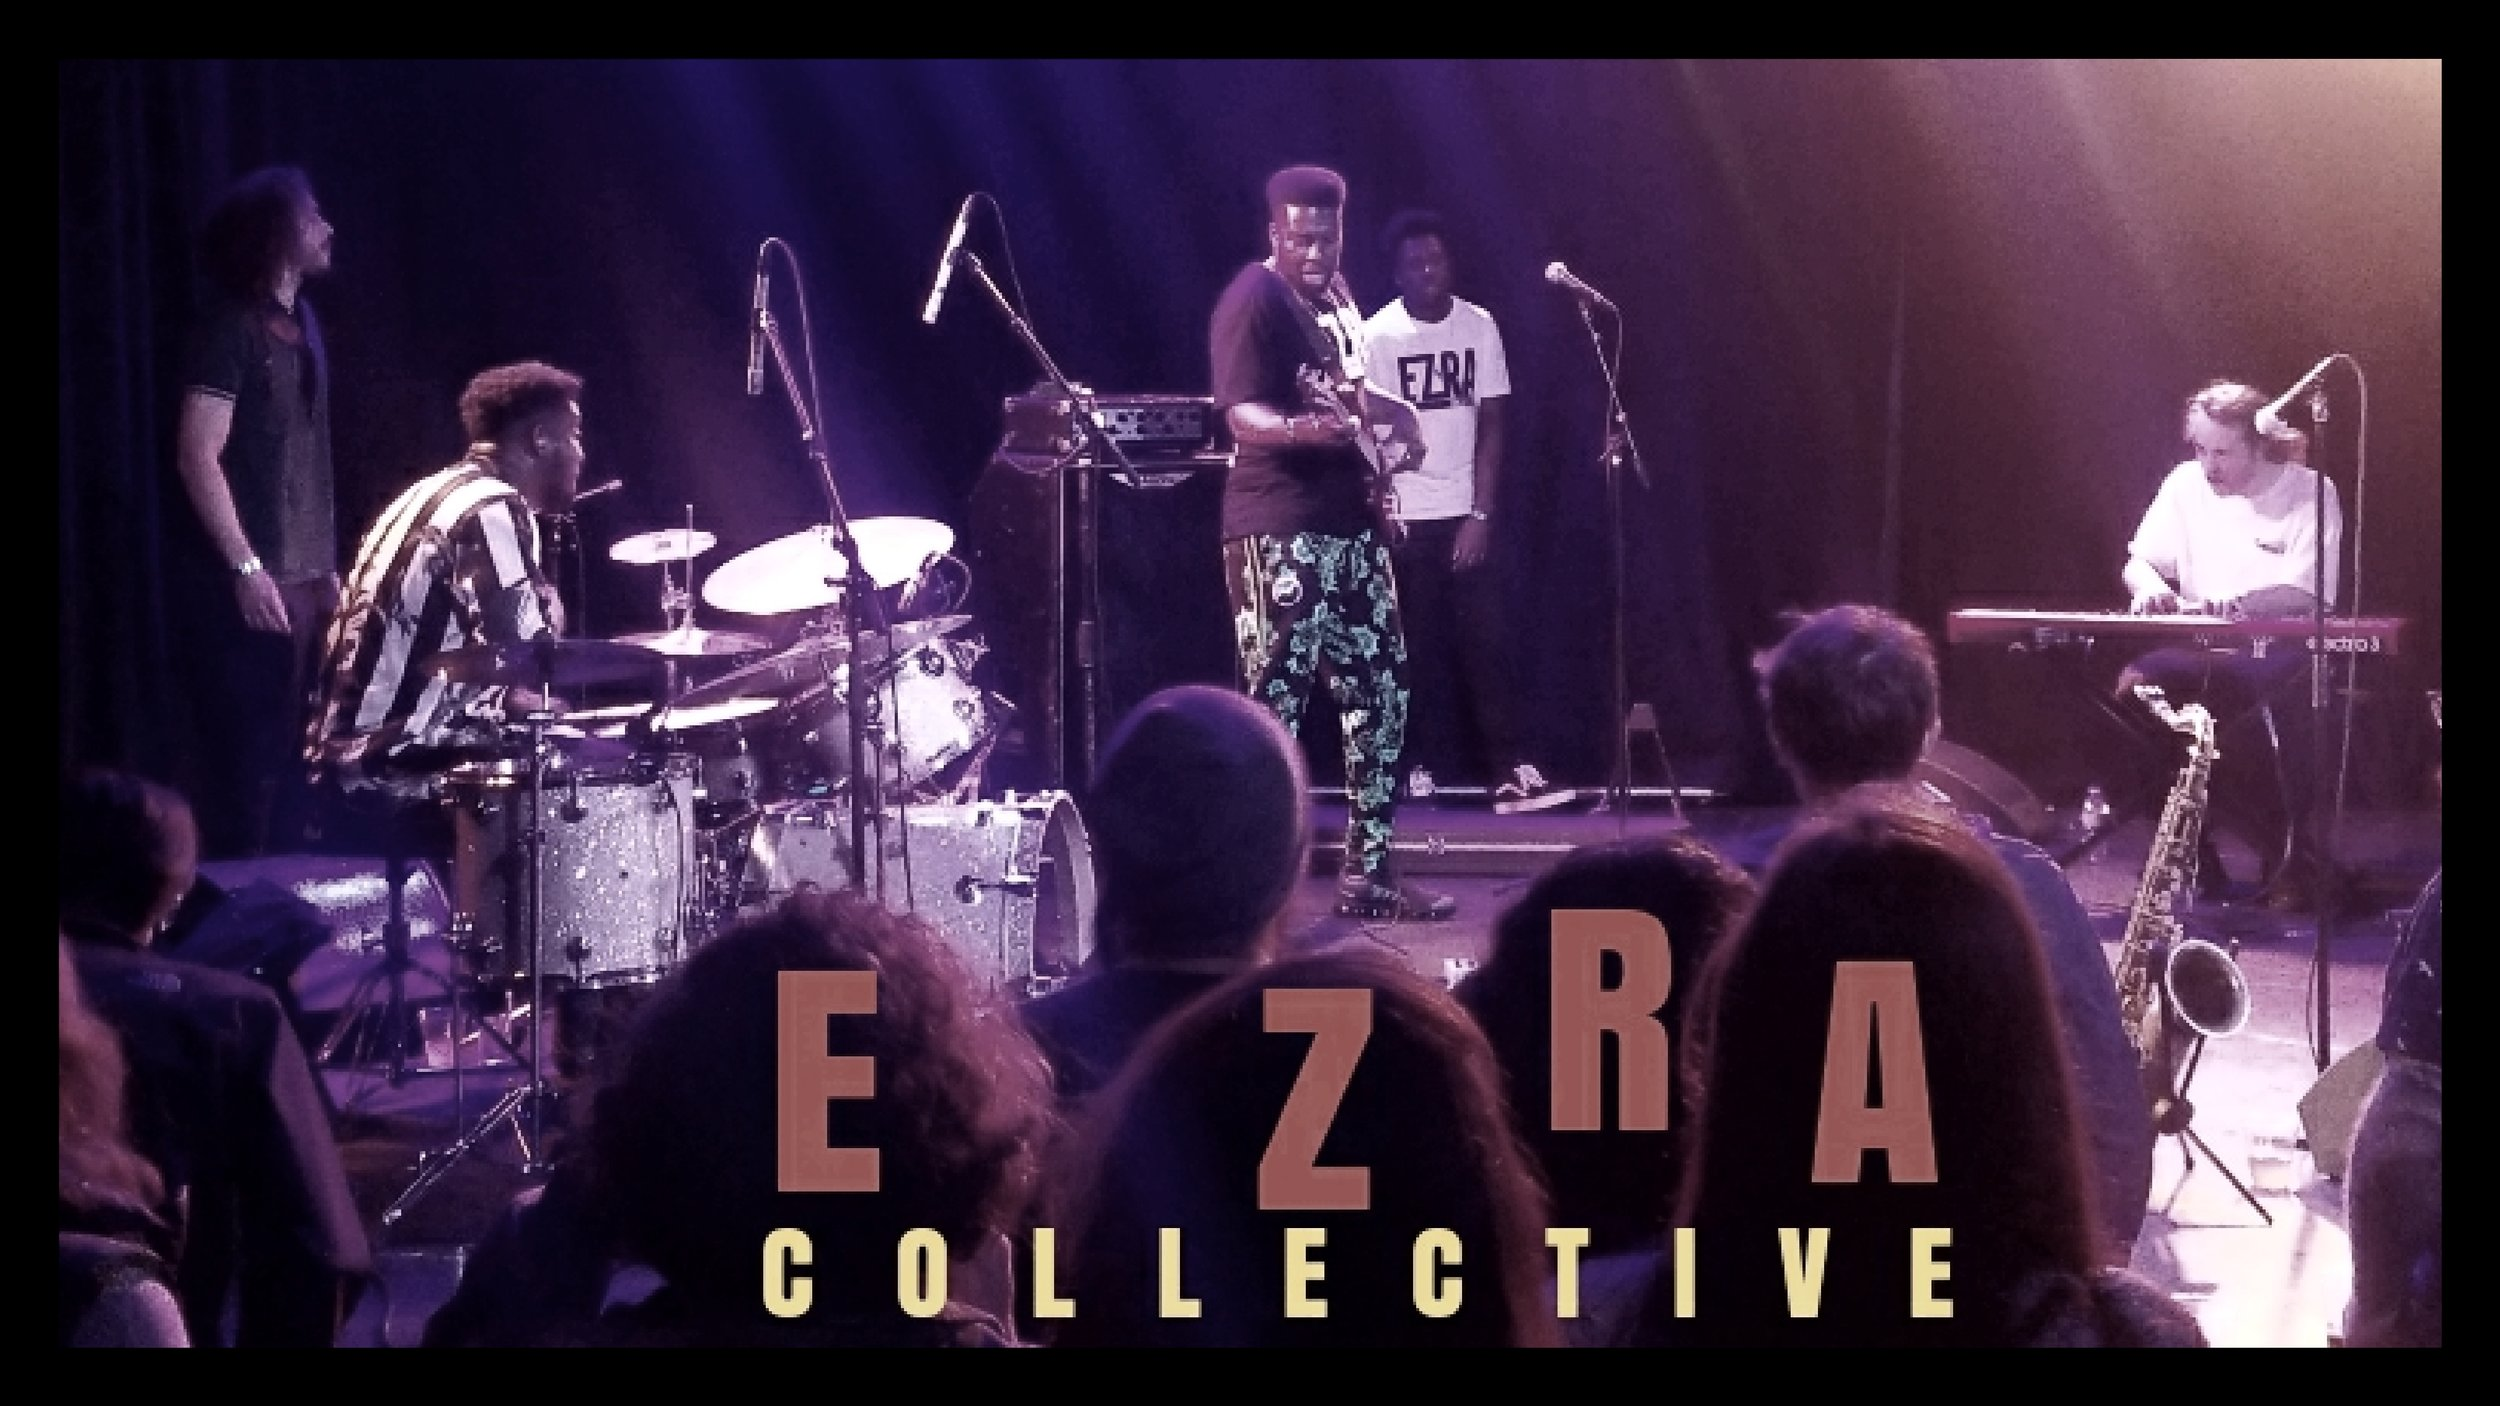 EZRA Collective [from Left]: James Mollison, Femi & TJ Koleoso, Ife Ogunjobi and Joe Armon-Jones…